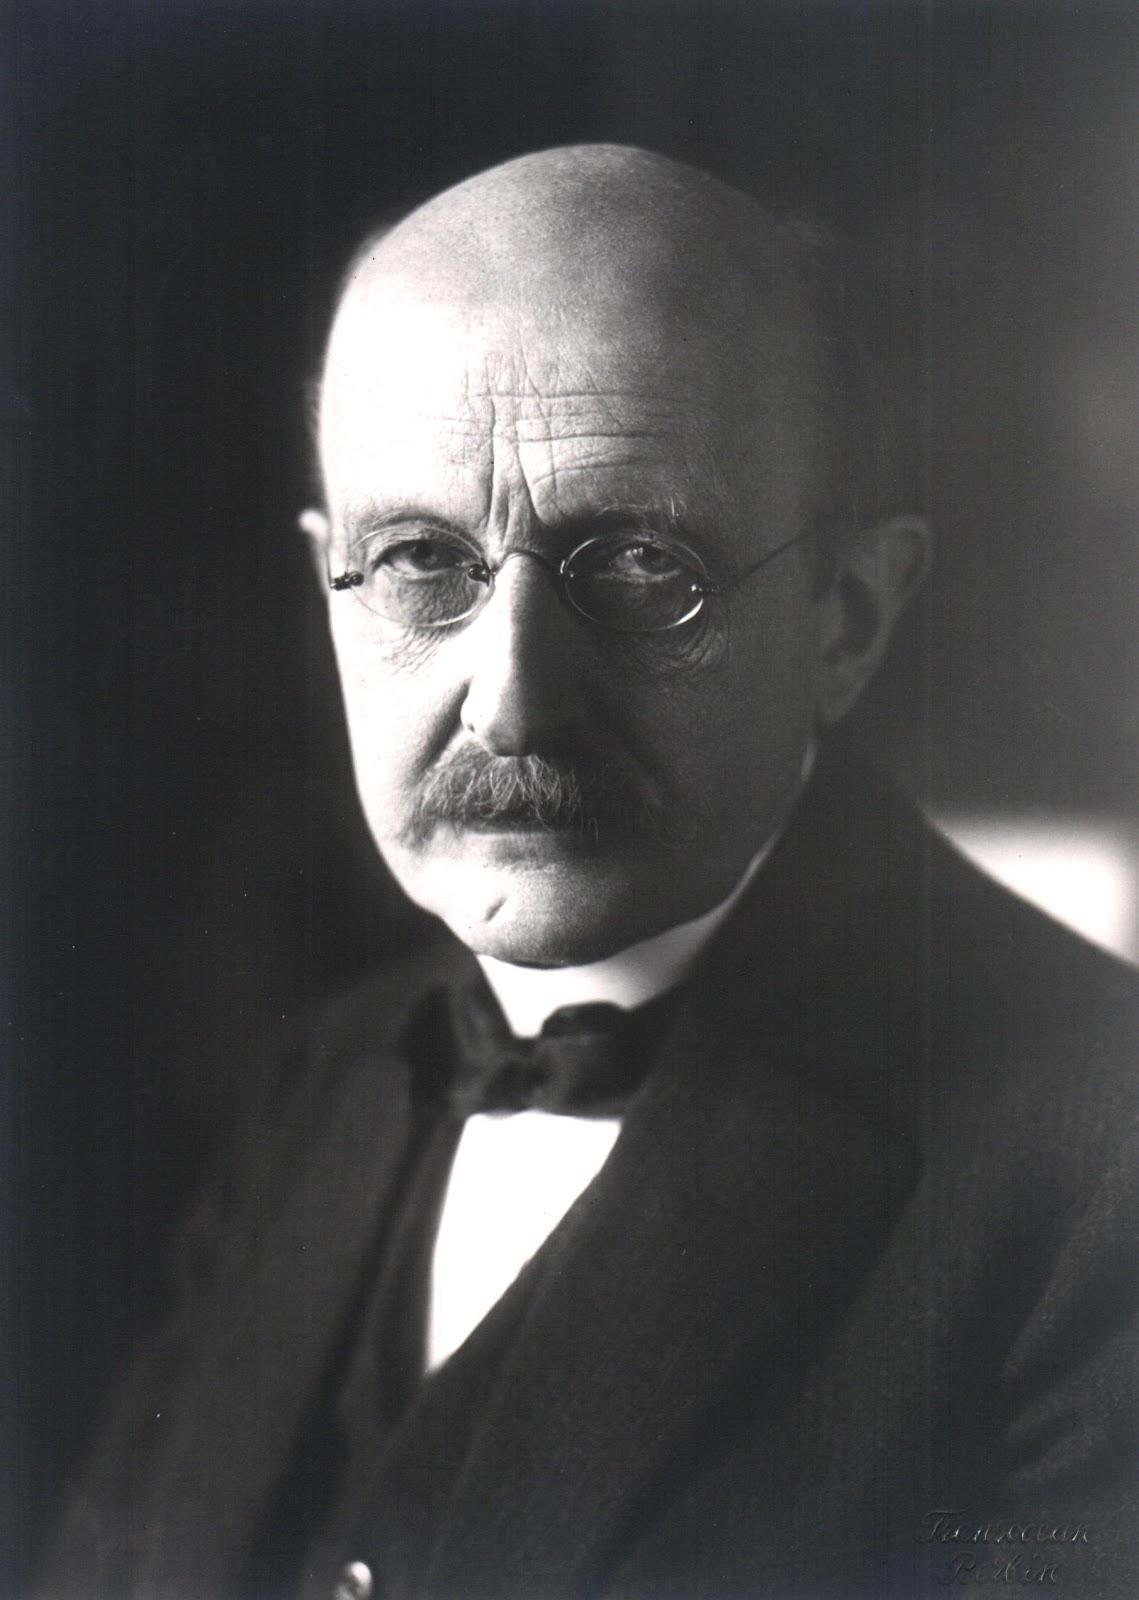 http://www.theepochtimes.com/n3/eet-content/uploads/2014/01/Max_Planck_1858-1947.jpg